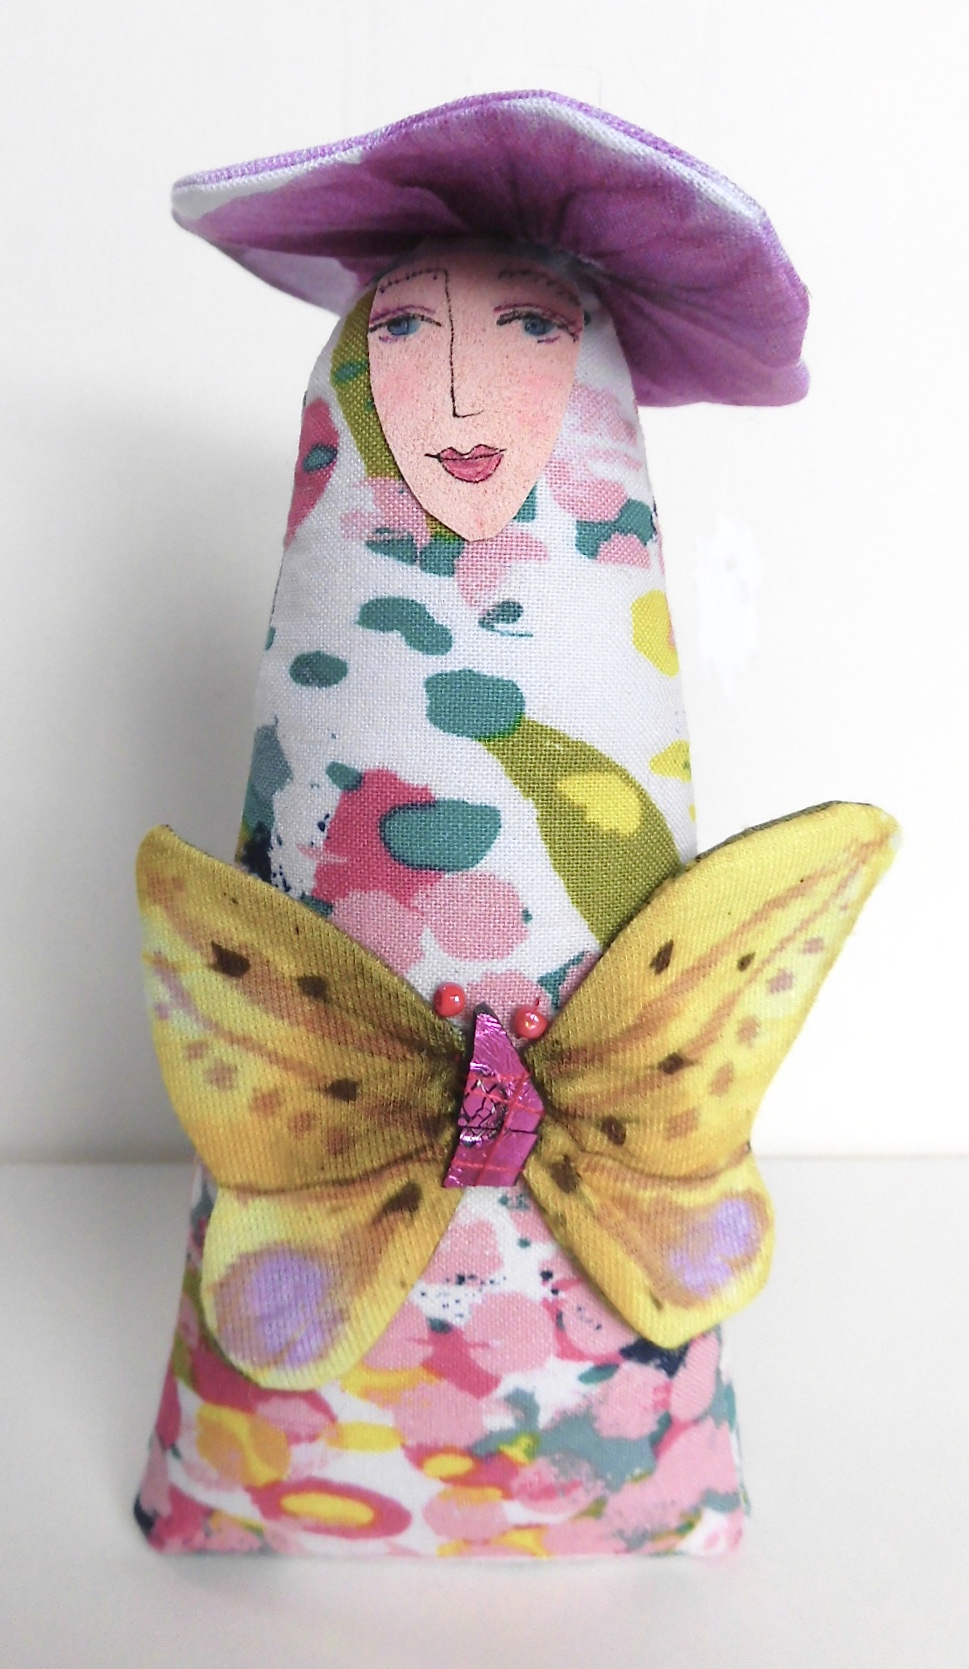 Little Lady by Jennifer Gould